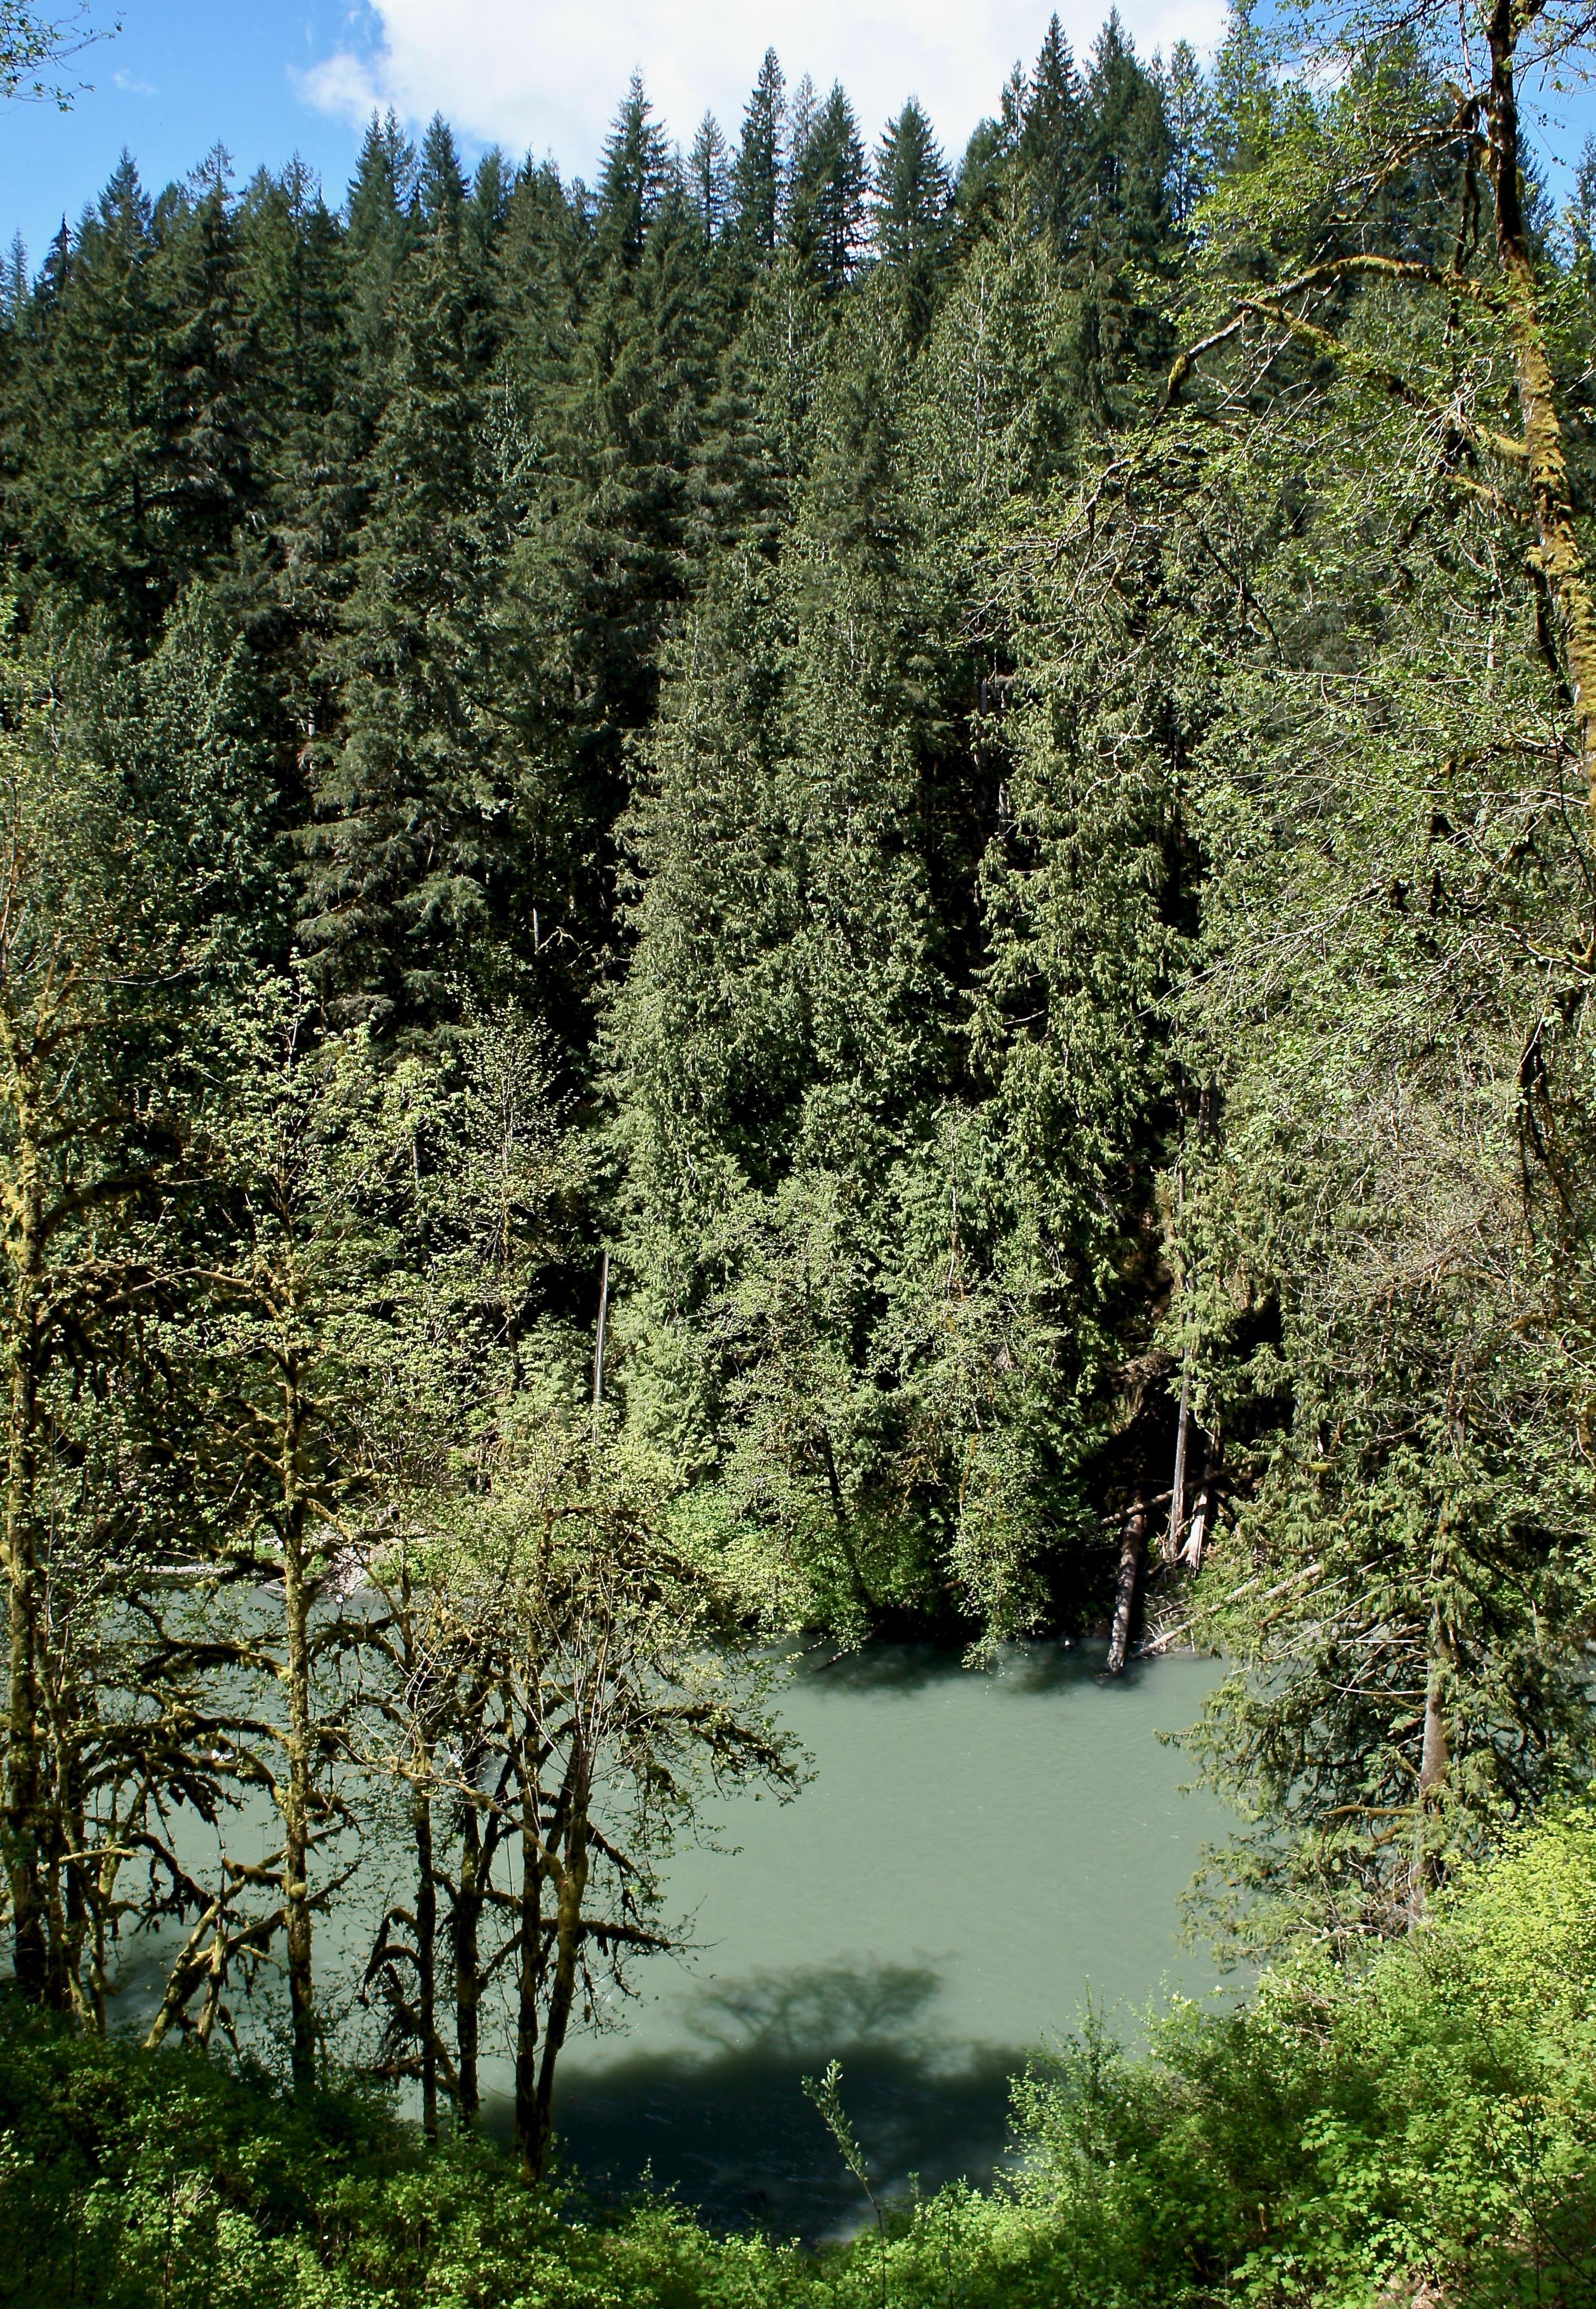 View of the Stillaguamish river.